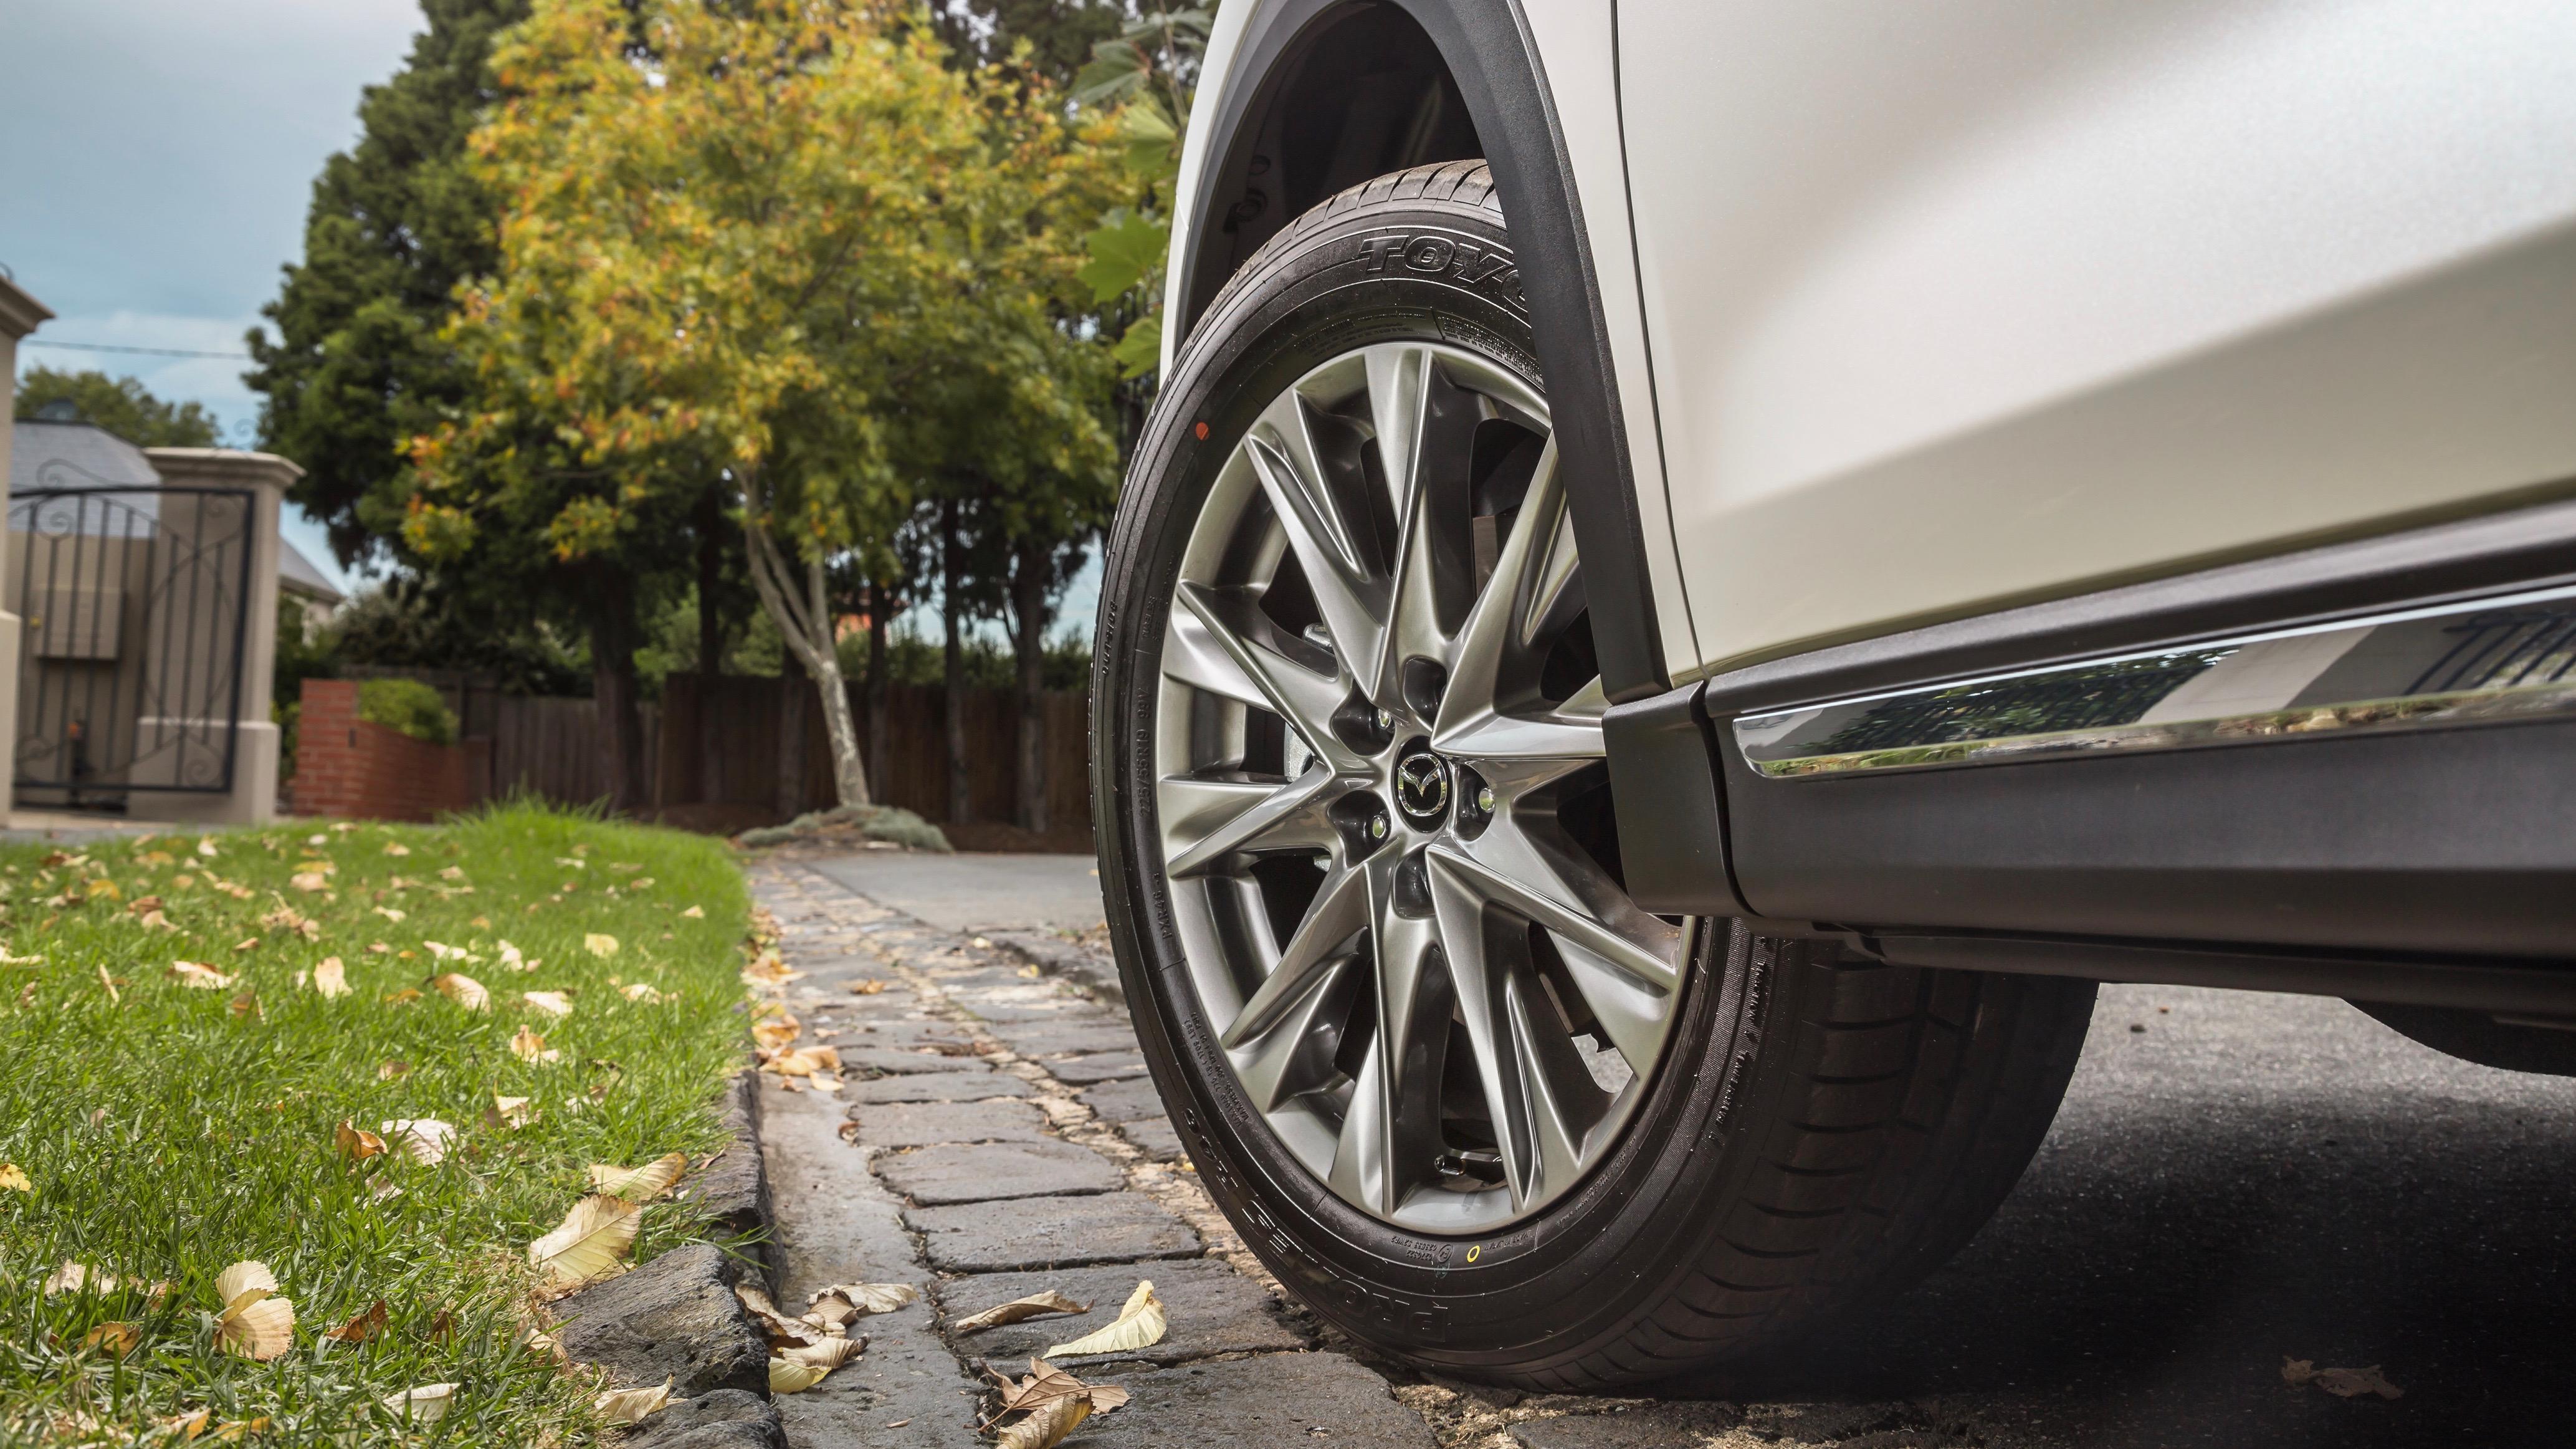 2018 Mazda CX-8 Asaki wheel